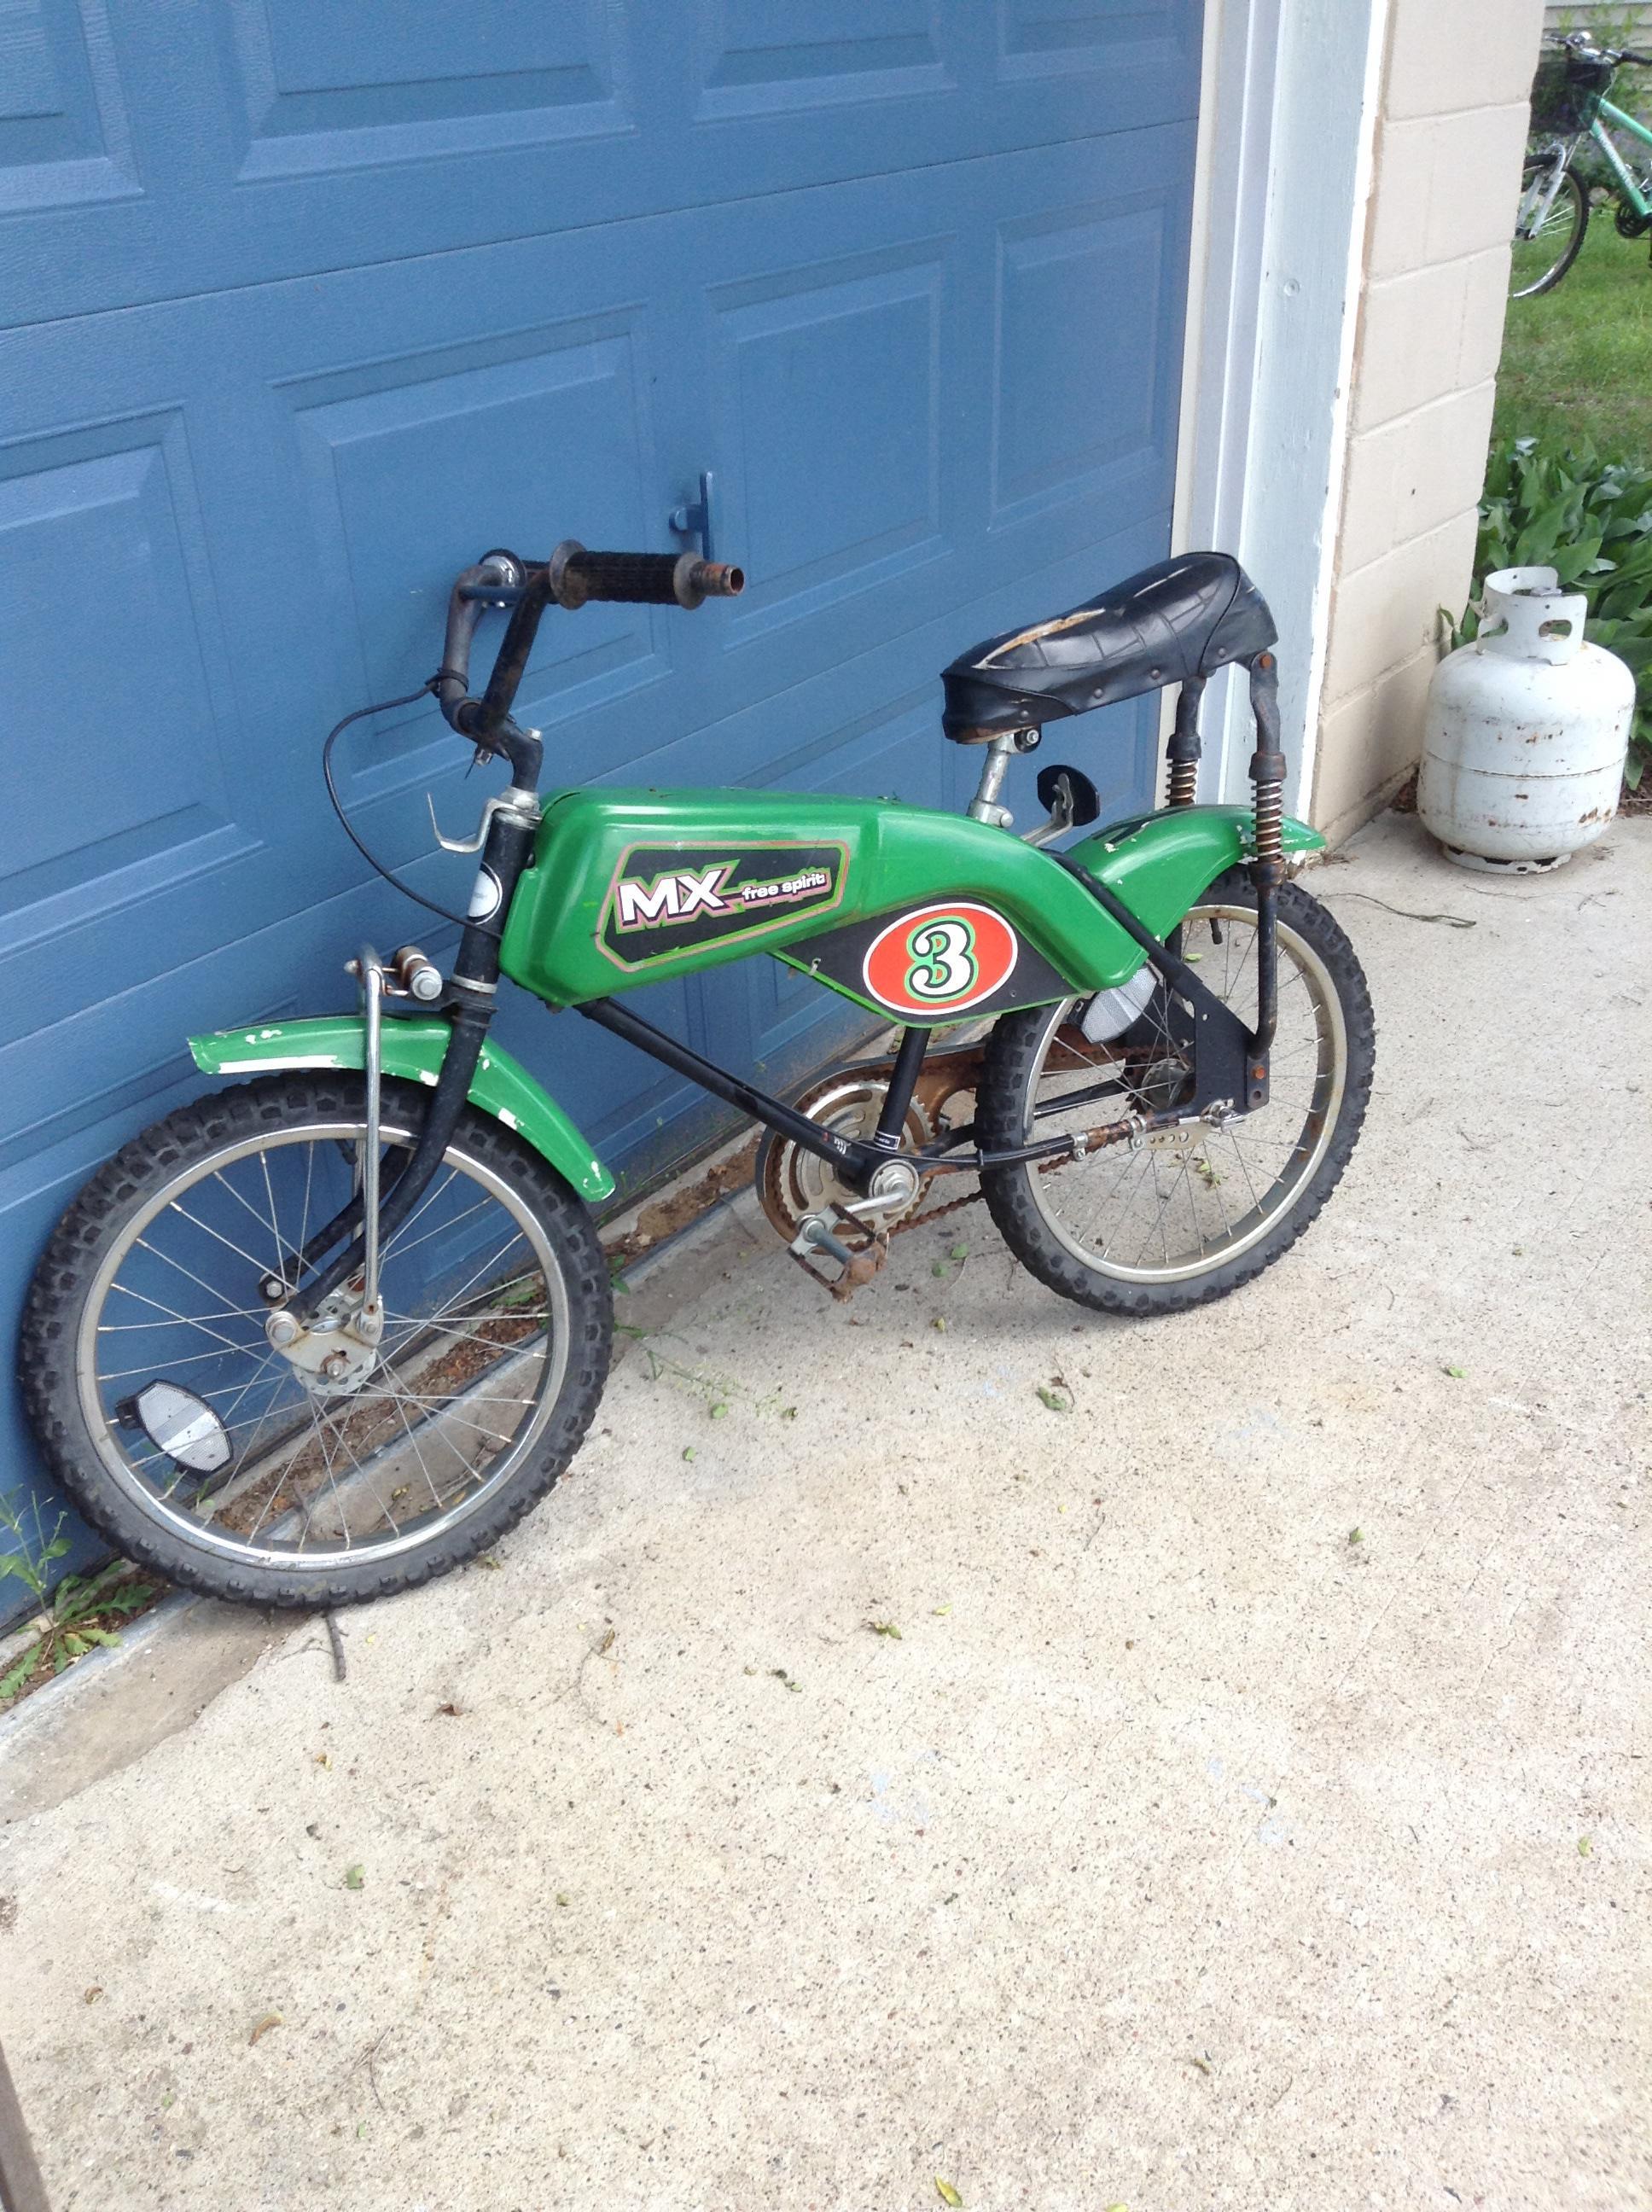 Sears roebucks free spirit mx bike antique appraisal instappraisal sears roebucks free spirit mx bike sciox Gallery